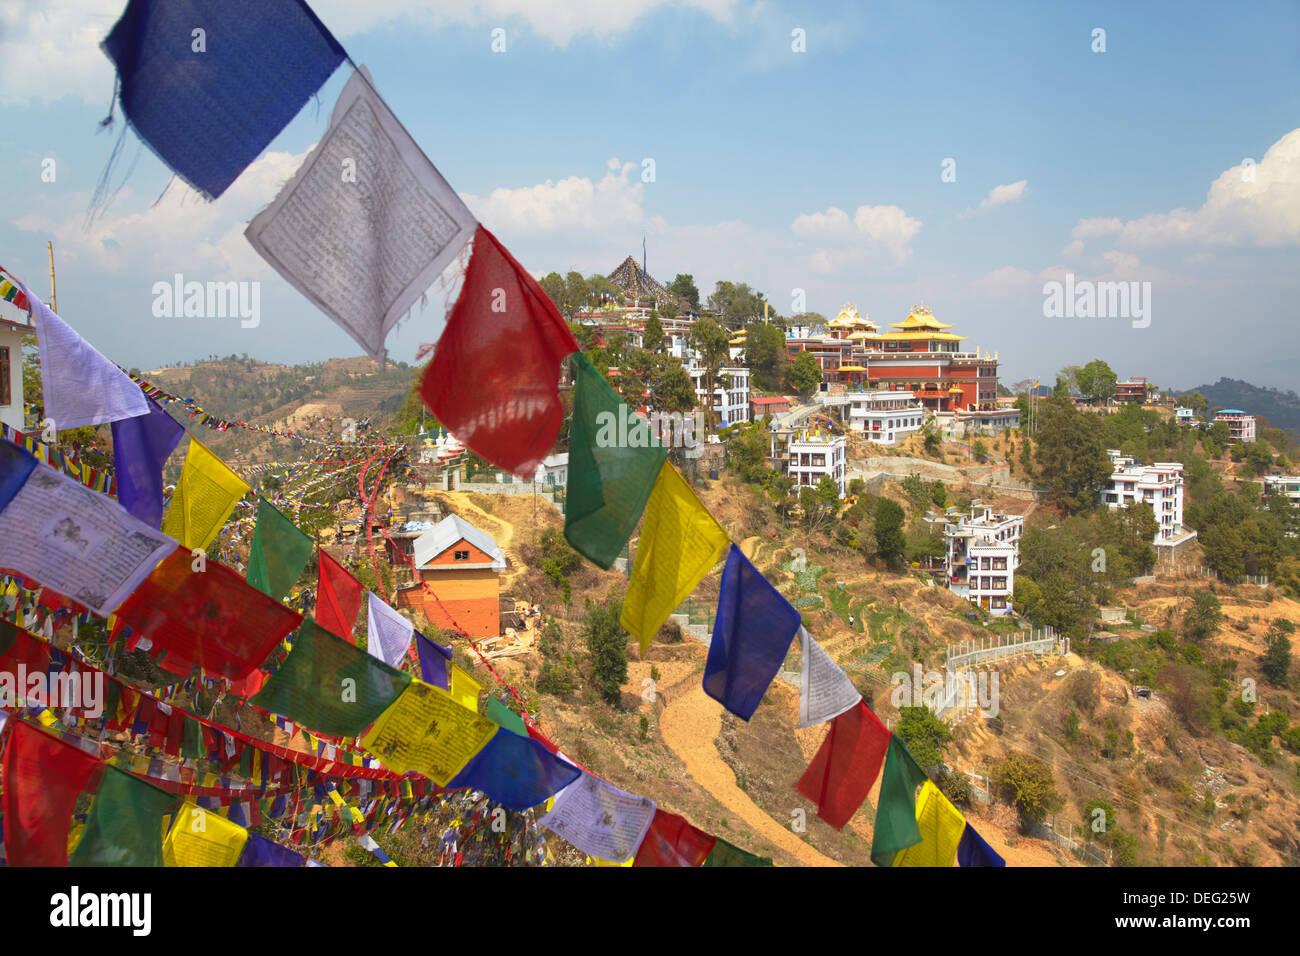 Thrangu Tashi Yangtse monastero all'interno complesso Namobuddha, Dhulikhel, Valle di Kathmandu, Nepal, Asia Immagini Stock